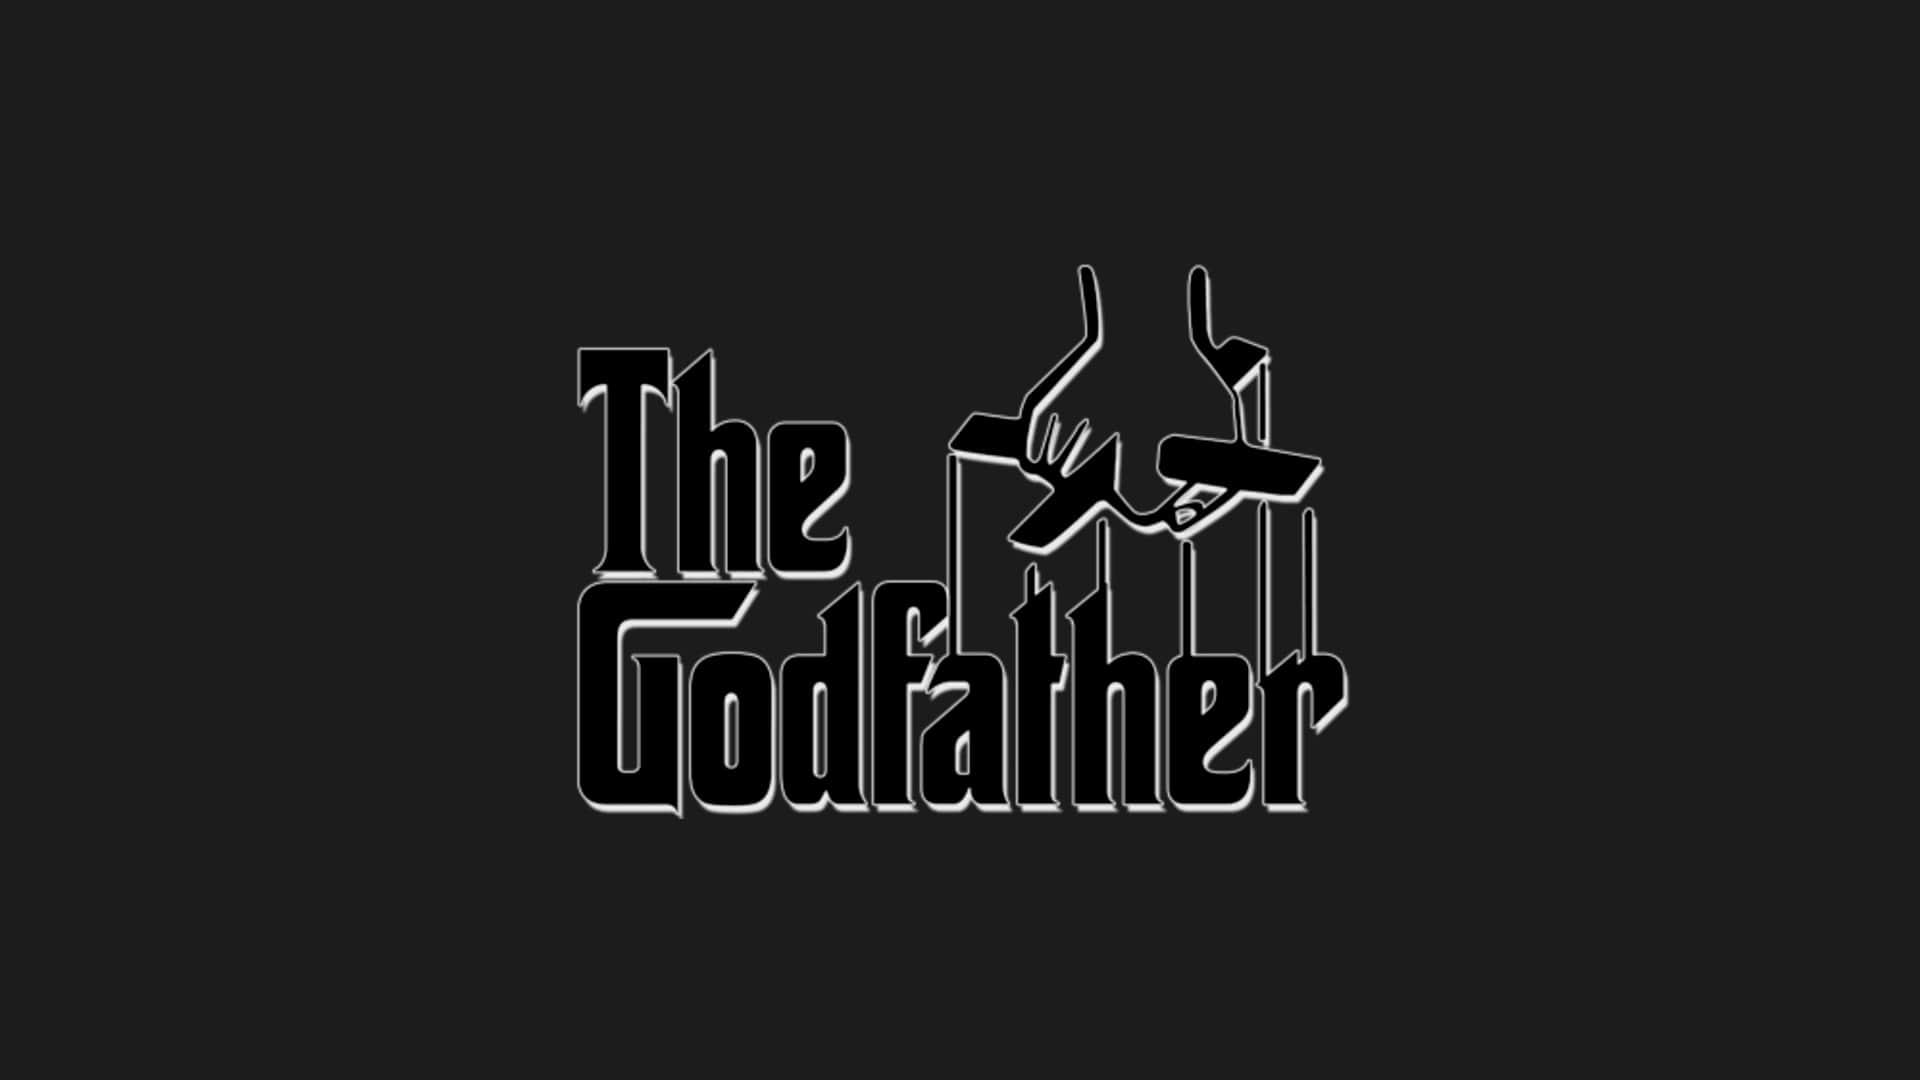 Logo of The Godfather (a movie made on Italian Mafia)